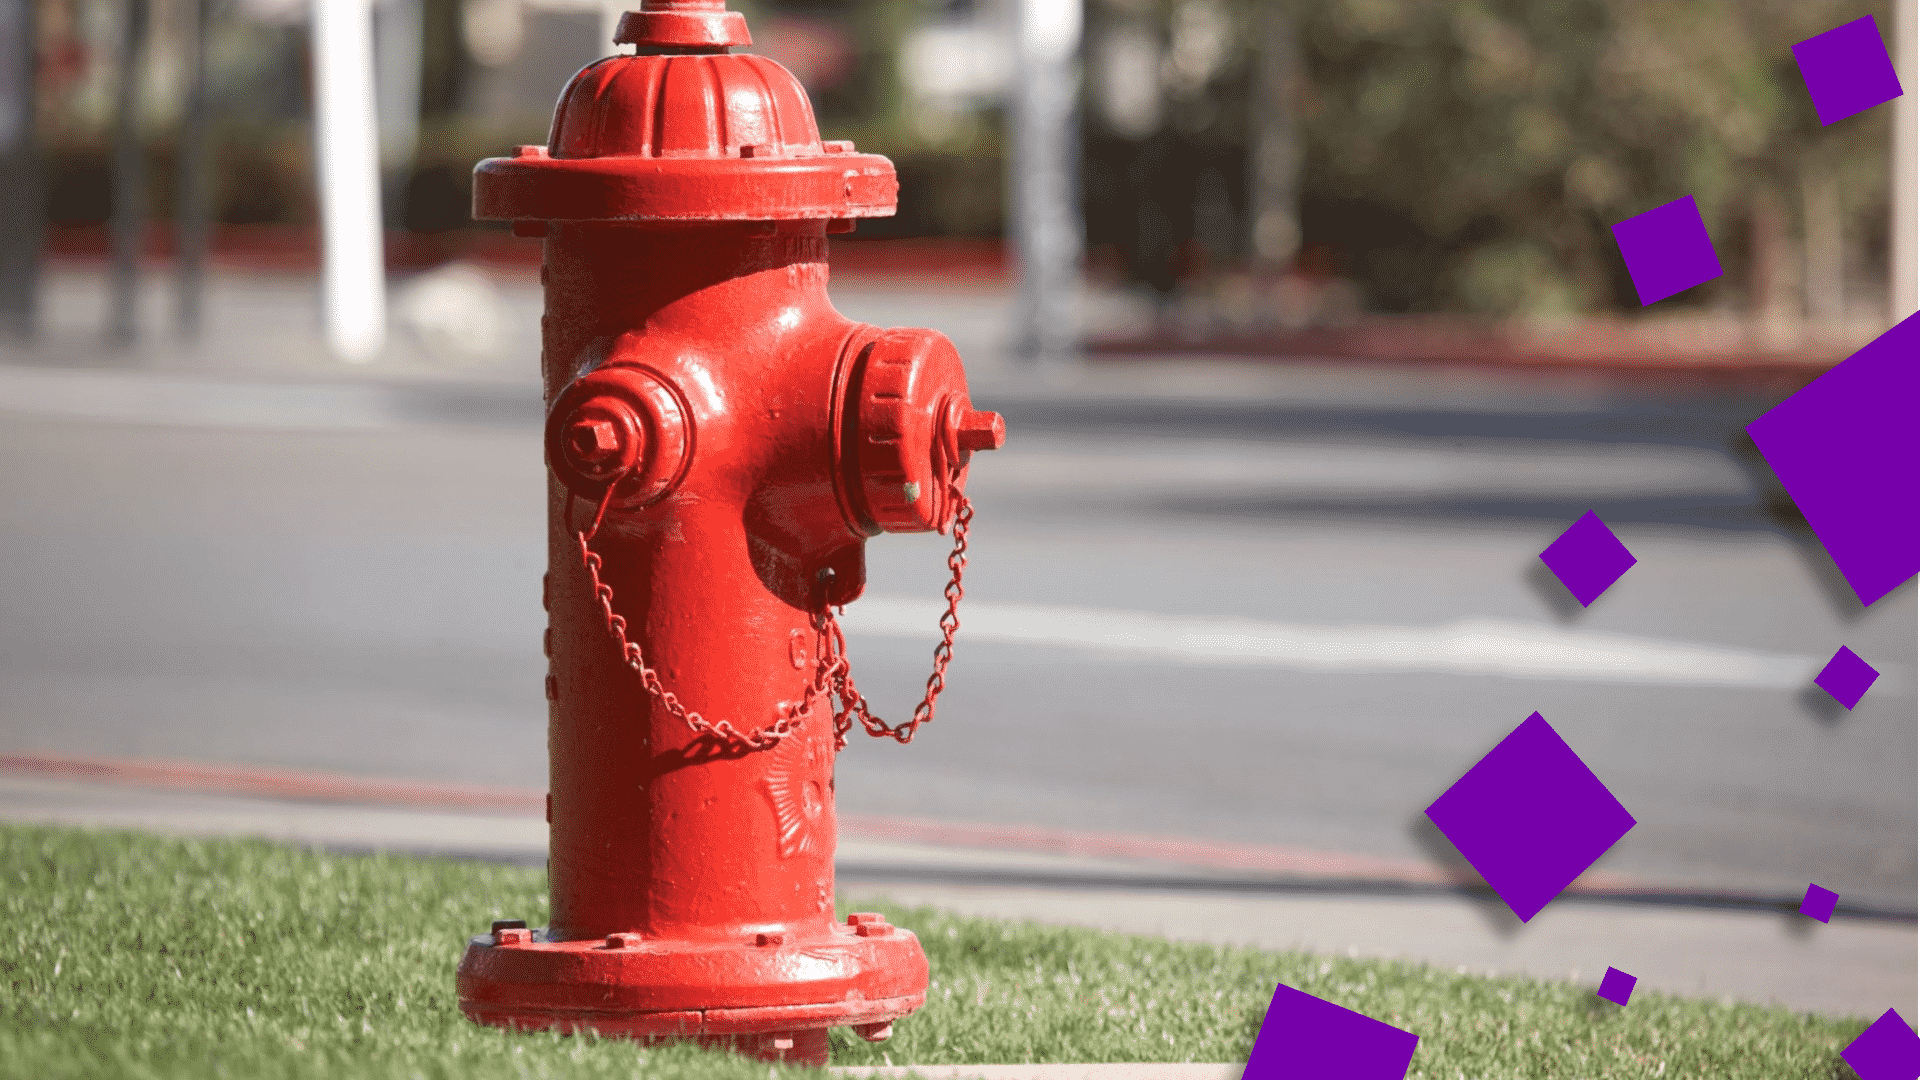 Ārējie hidranti